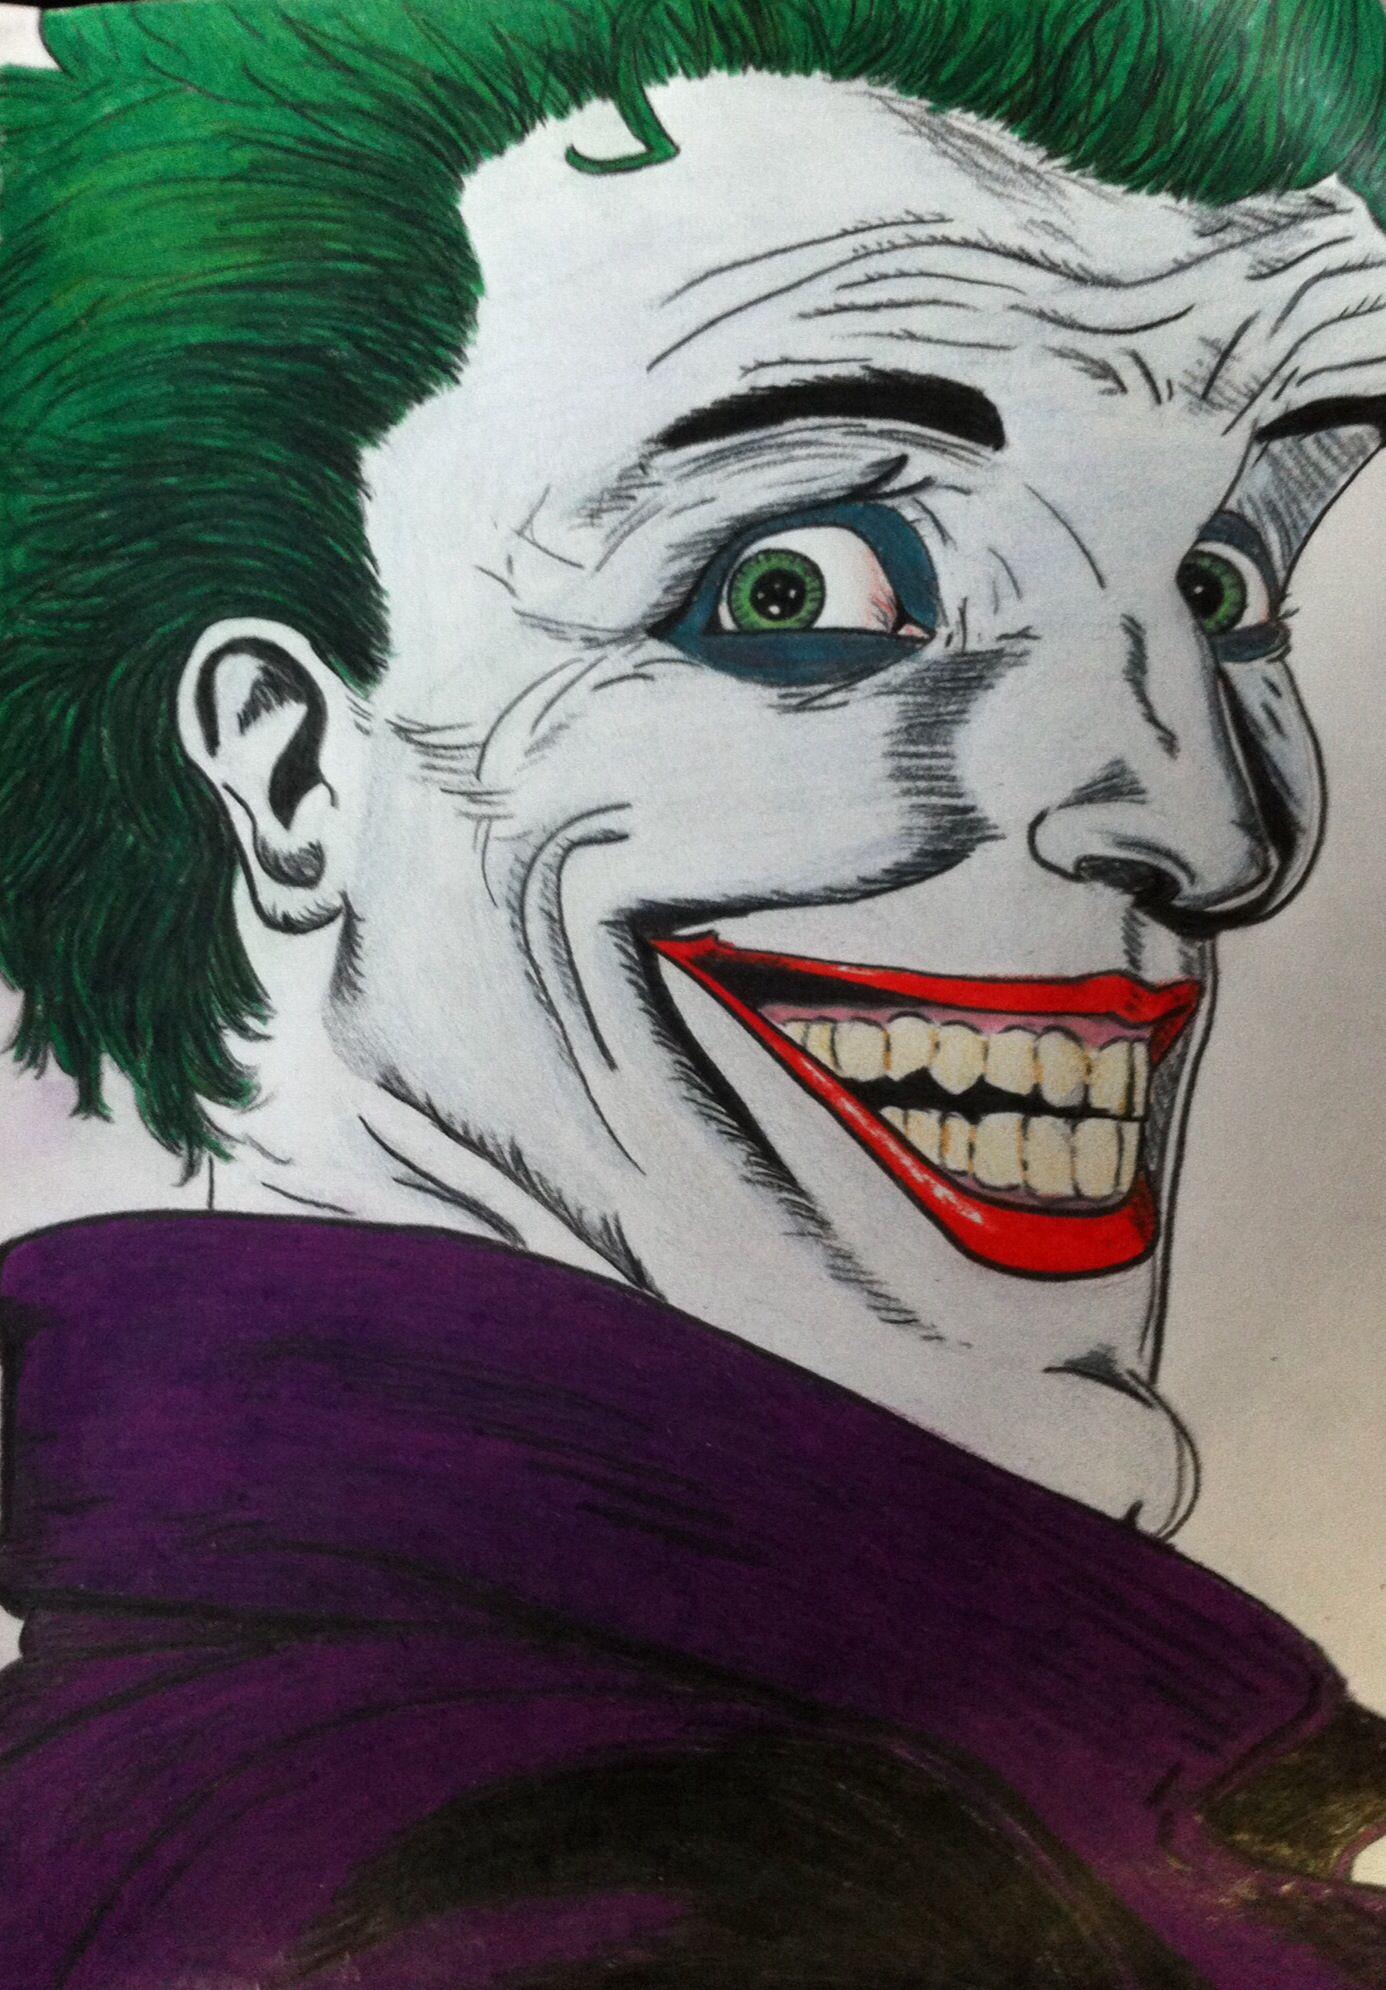 My drawing of the joker. | Art | Drawings, Joker drawings ...